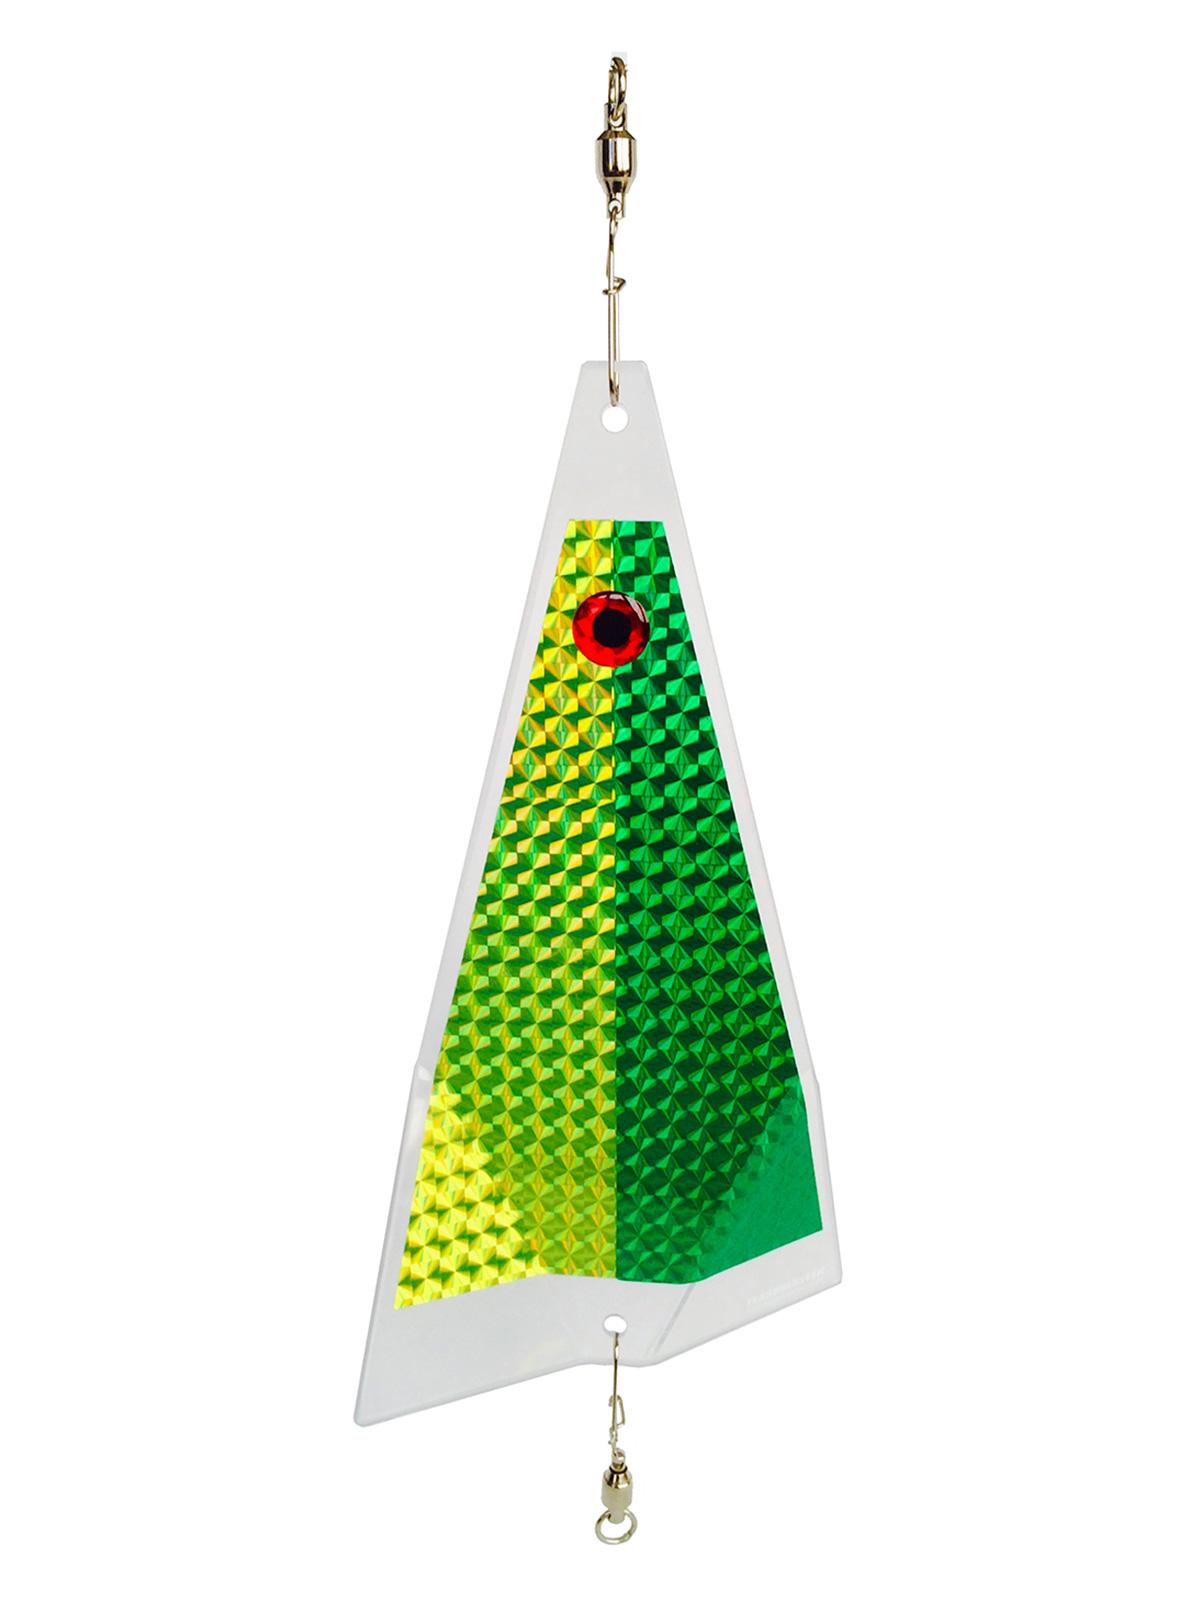 sweet pea clear split fishing lure